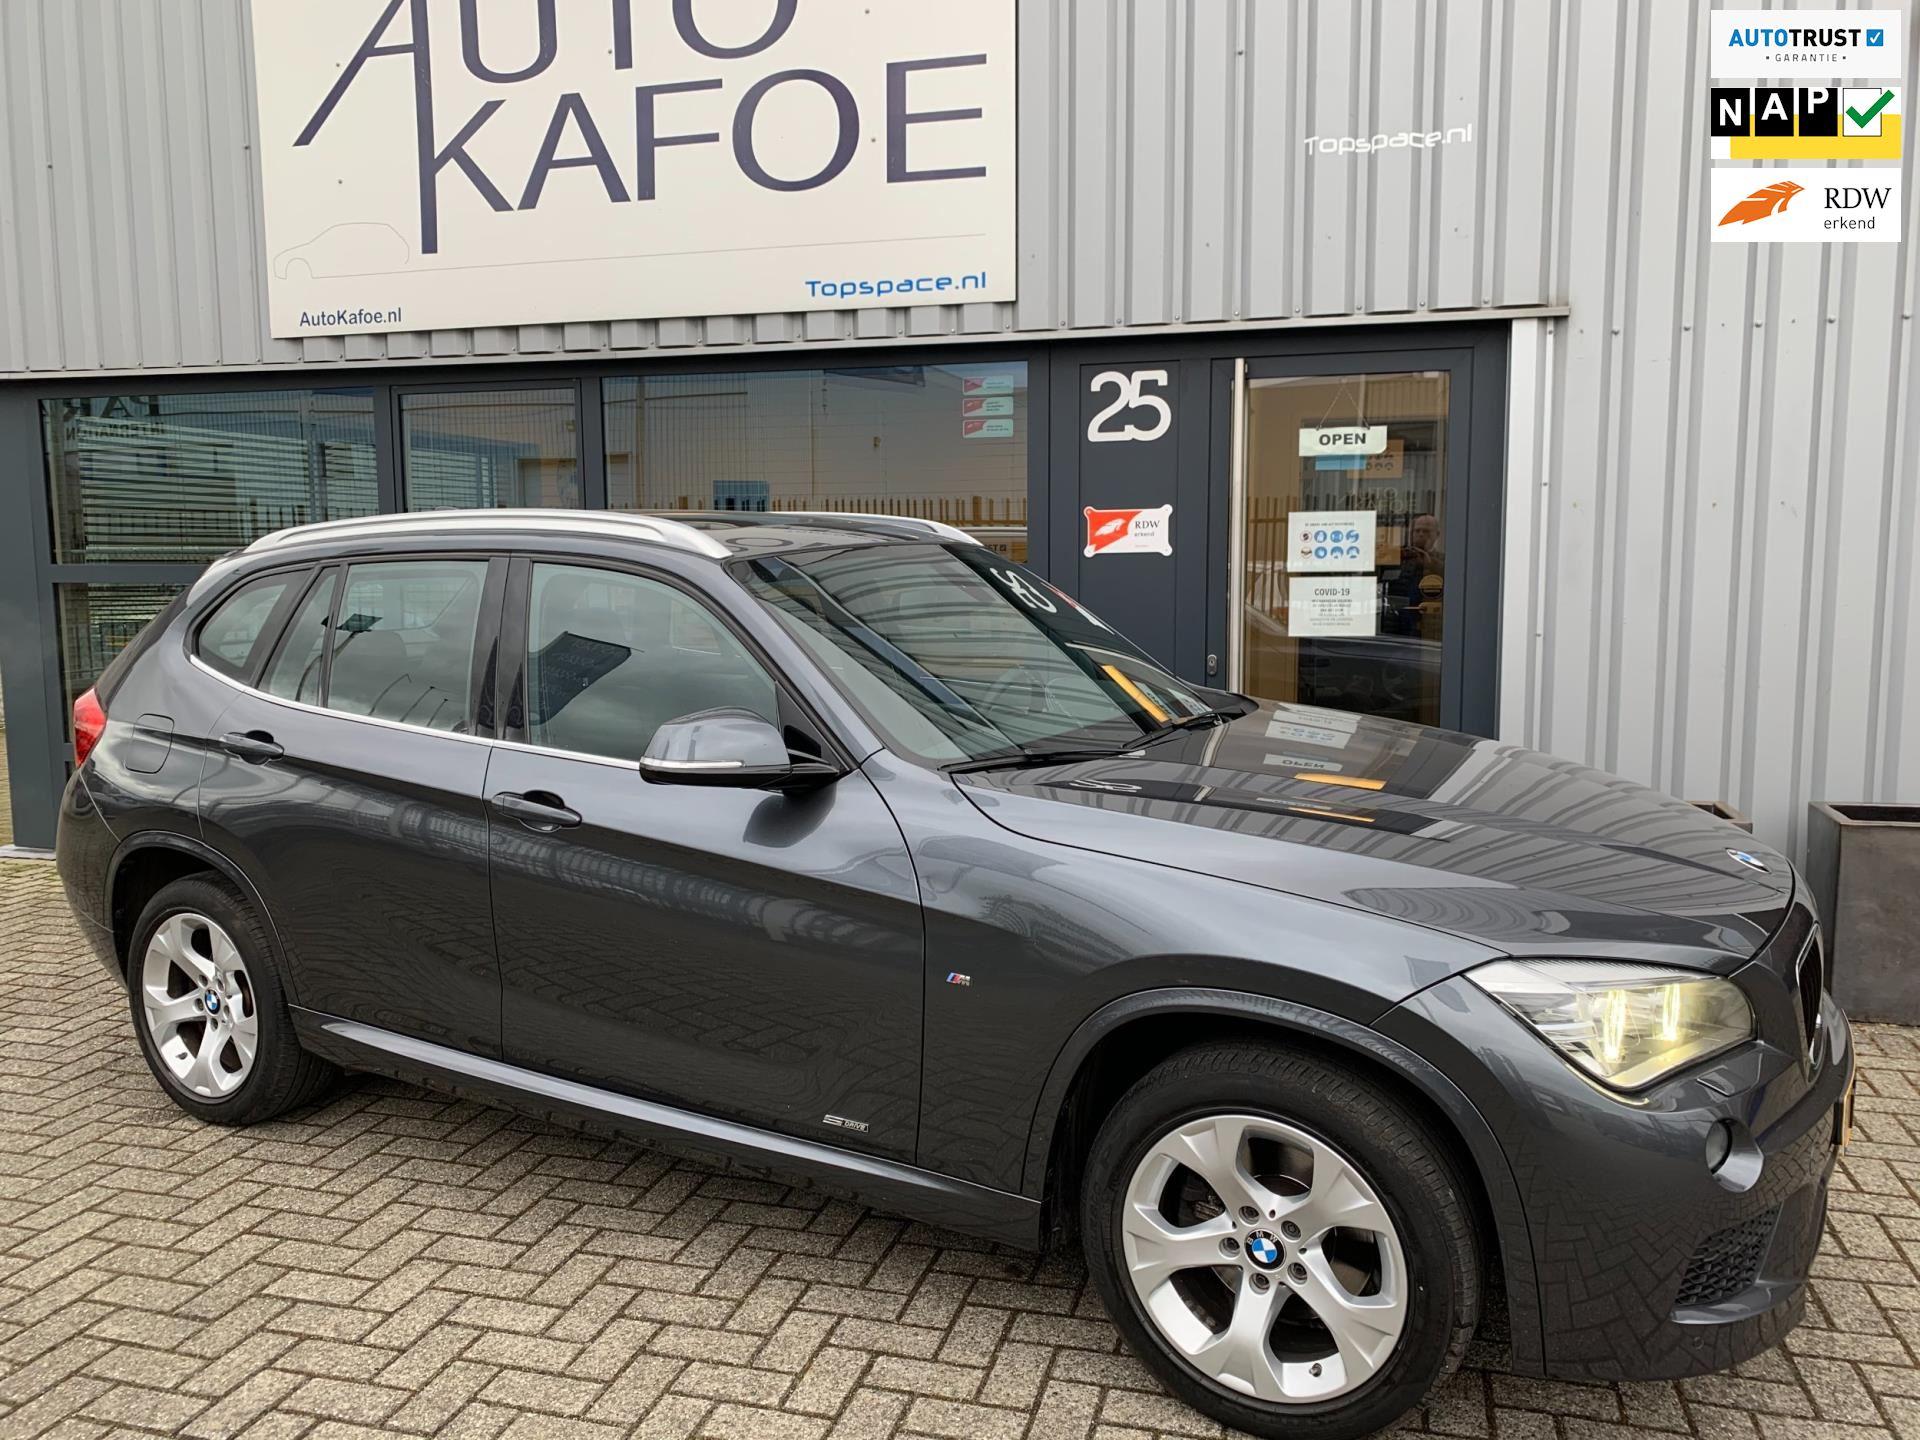 BMW X1 SDrive 20i High Exe M-Sport Pano dak ECC NAVI Xenon occasion - AutoKafoe v.o.f.